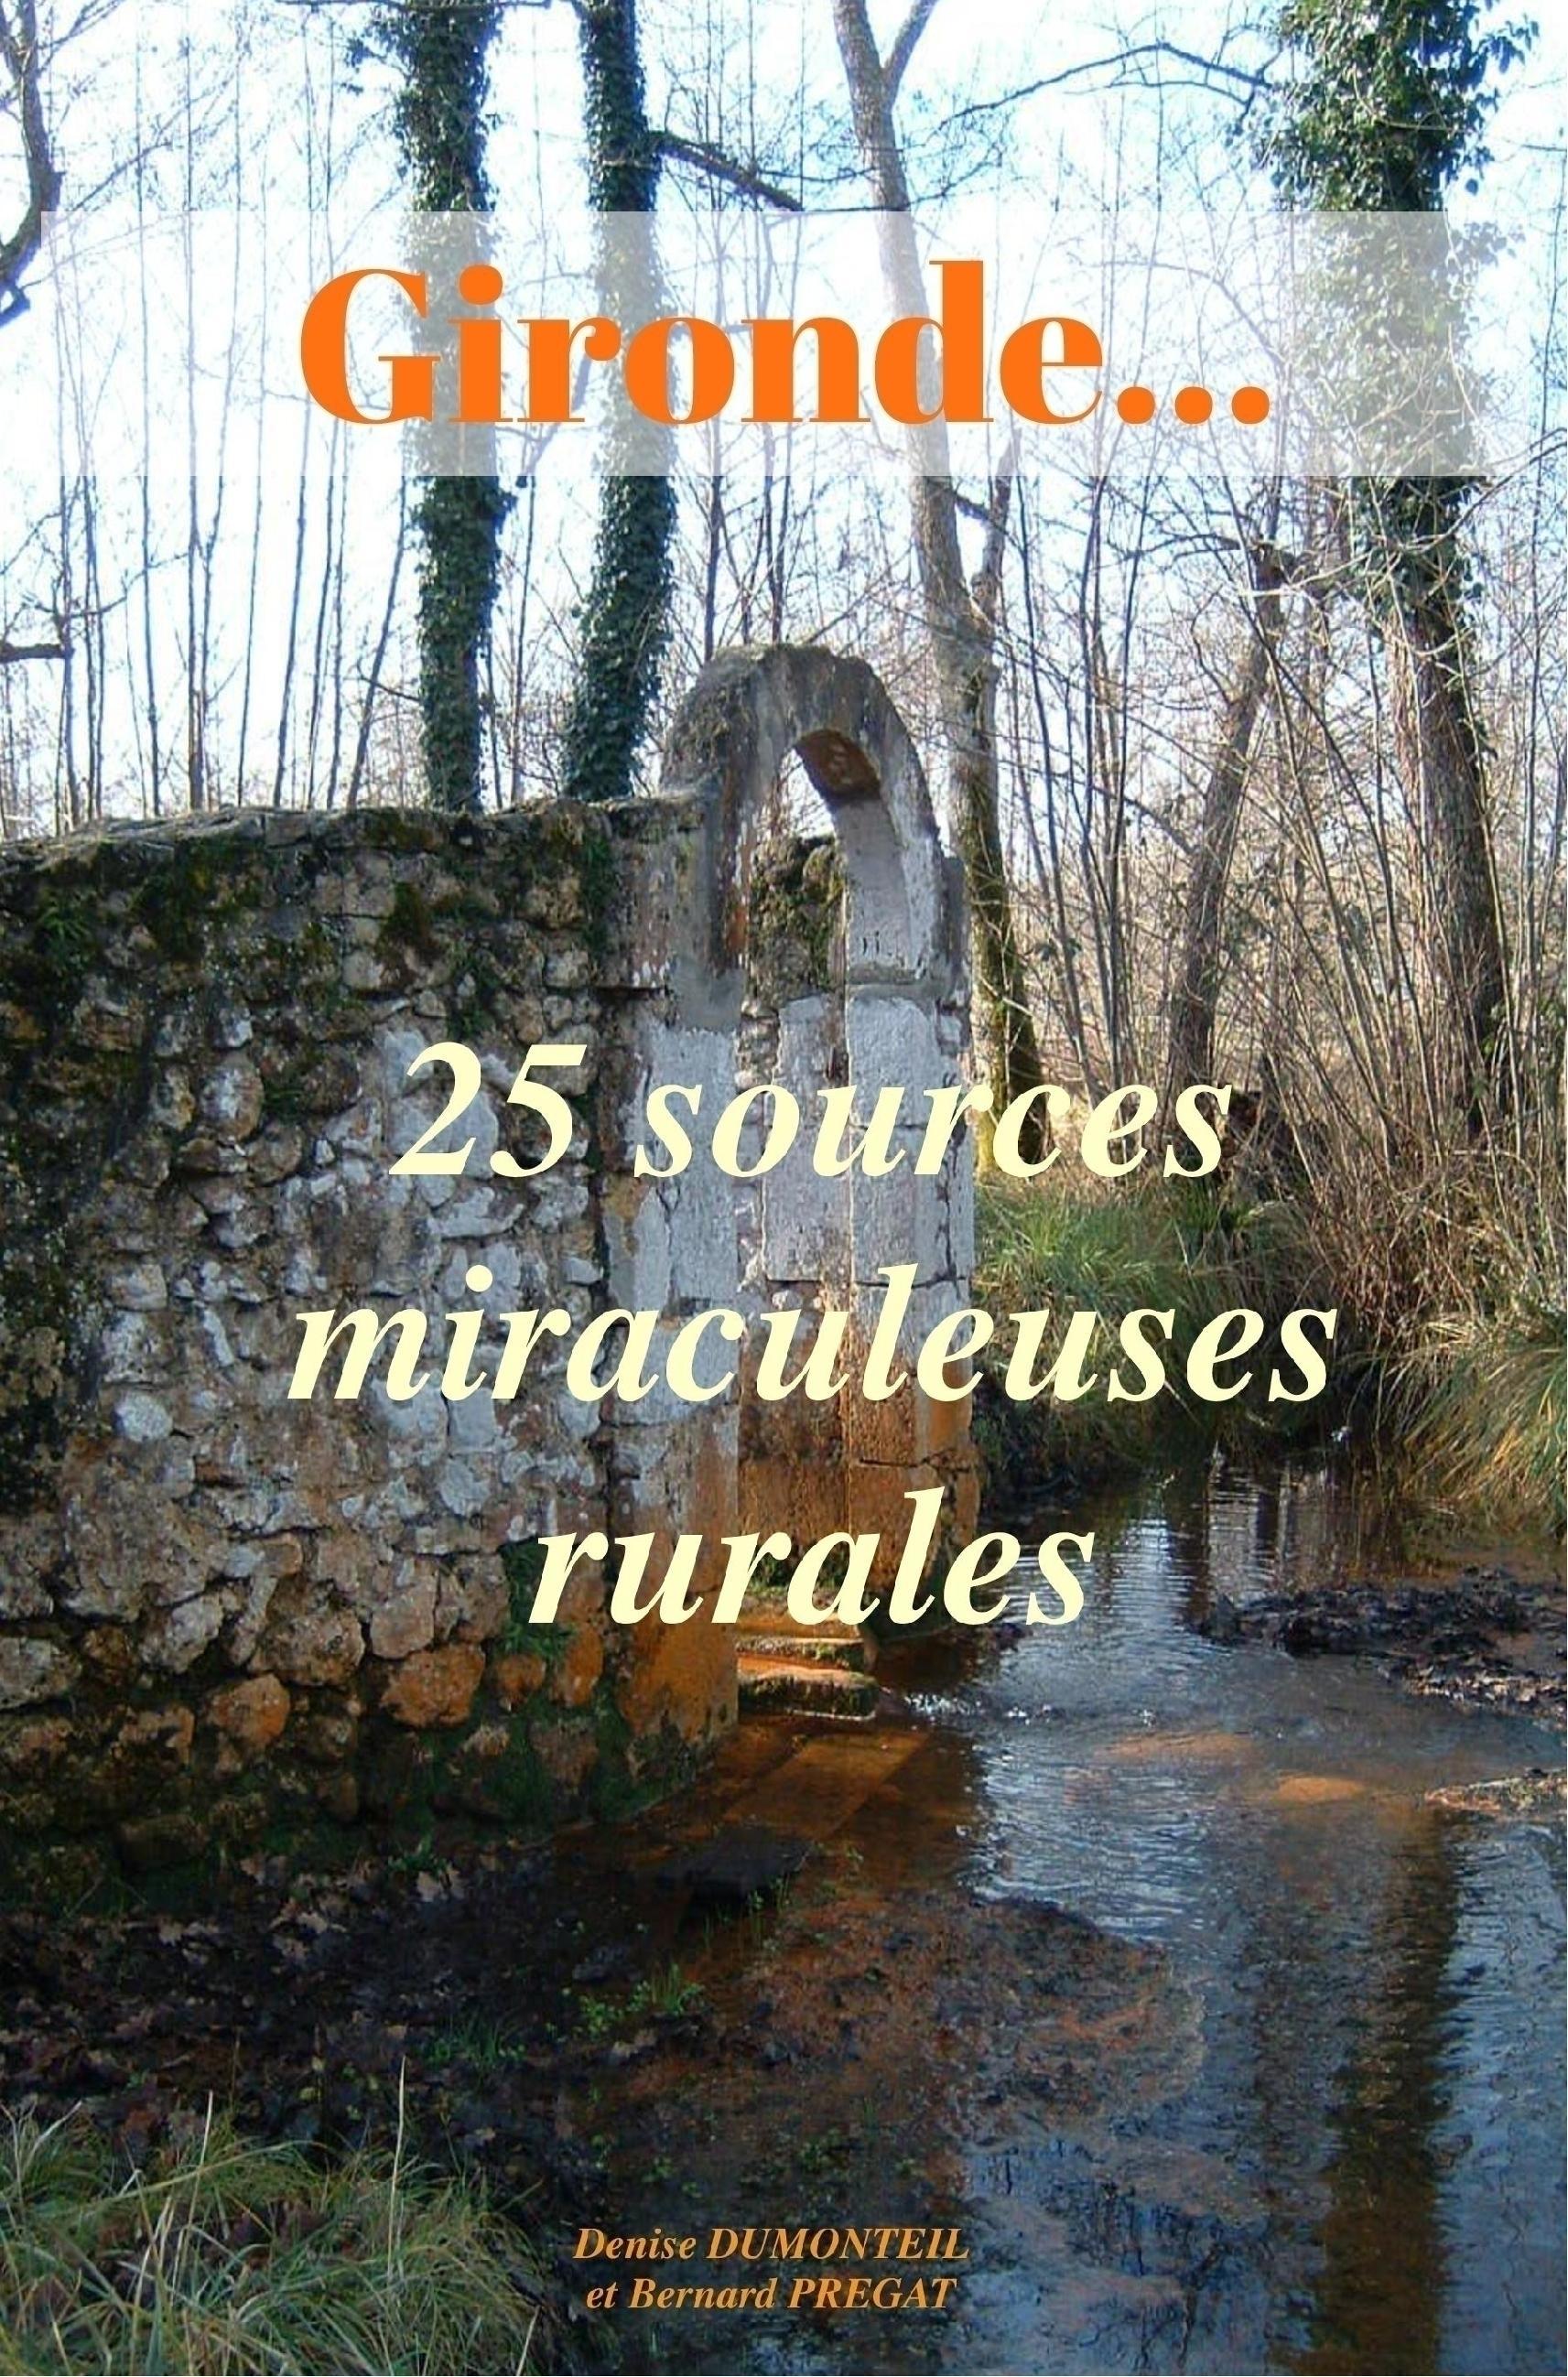 GIRONDE... 25 SOURCES MIRACULEUSES RURALES